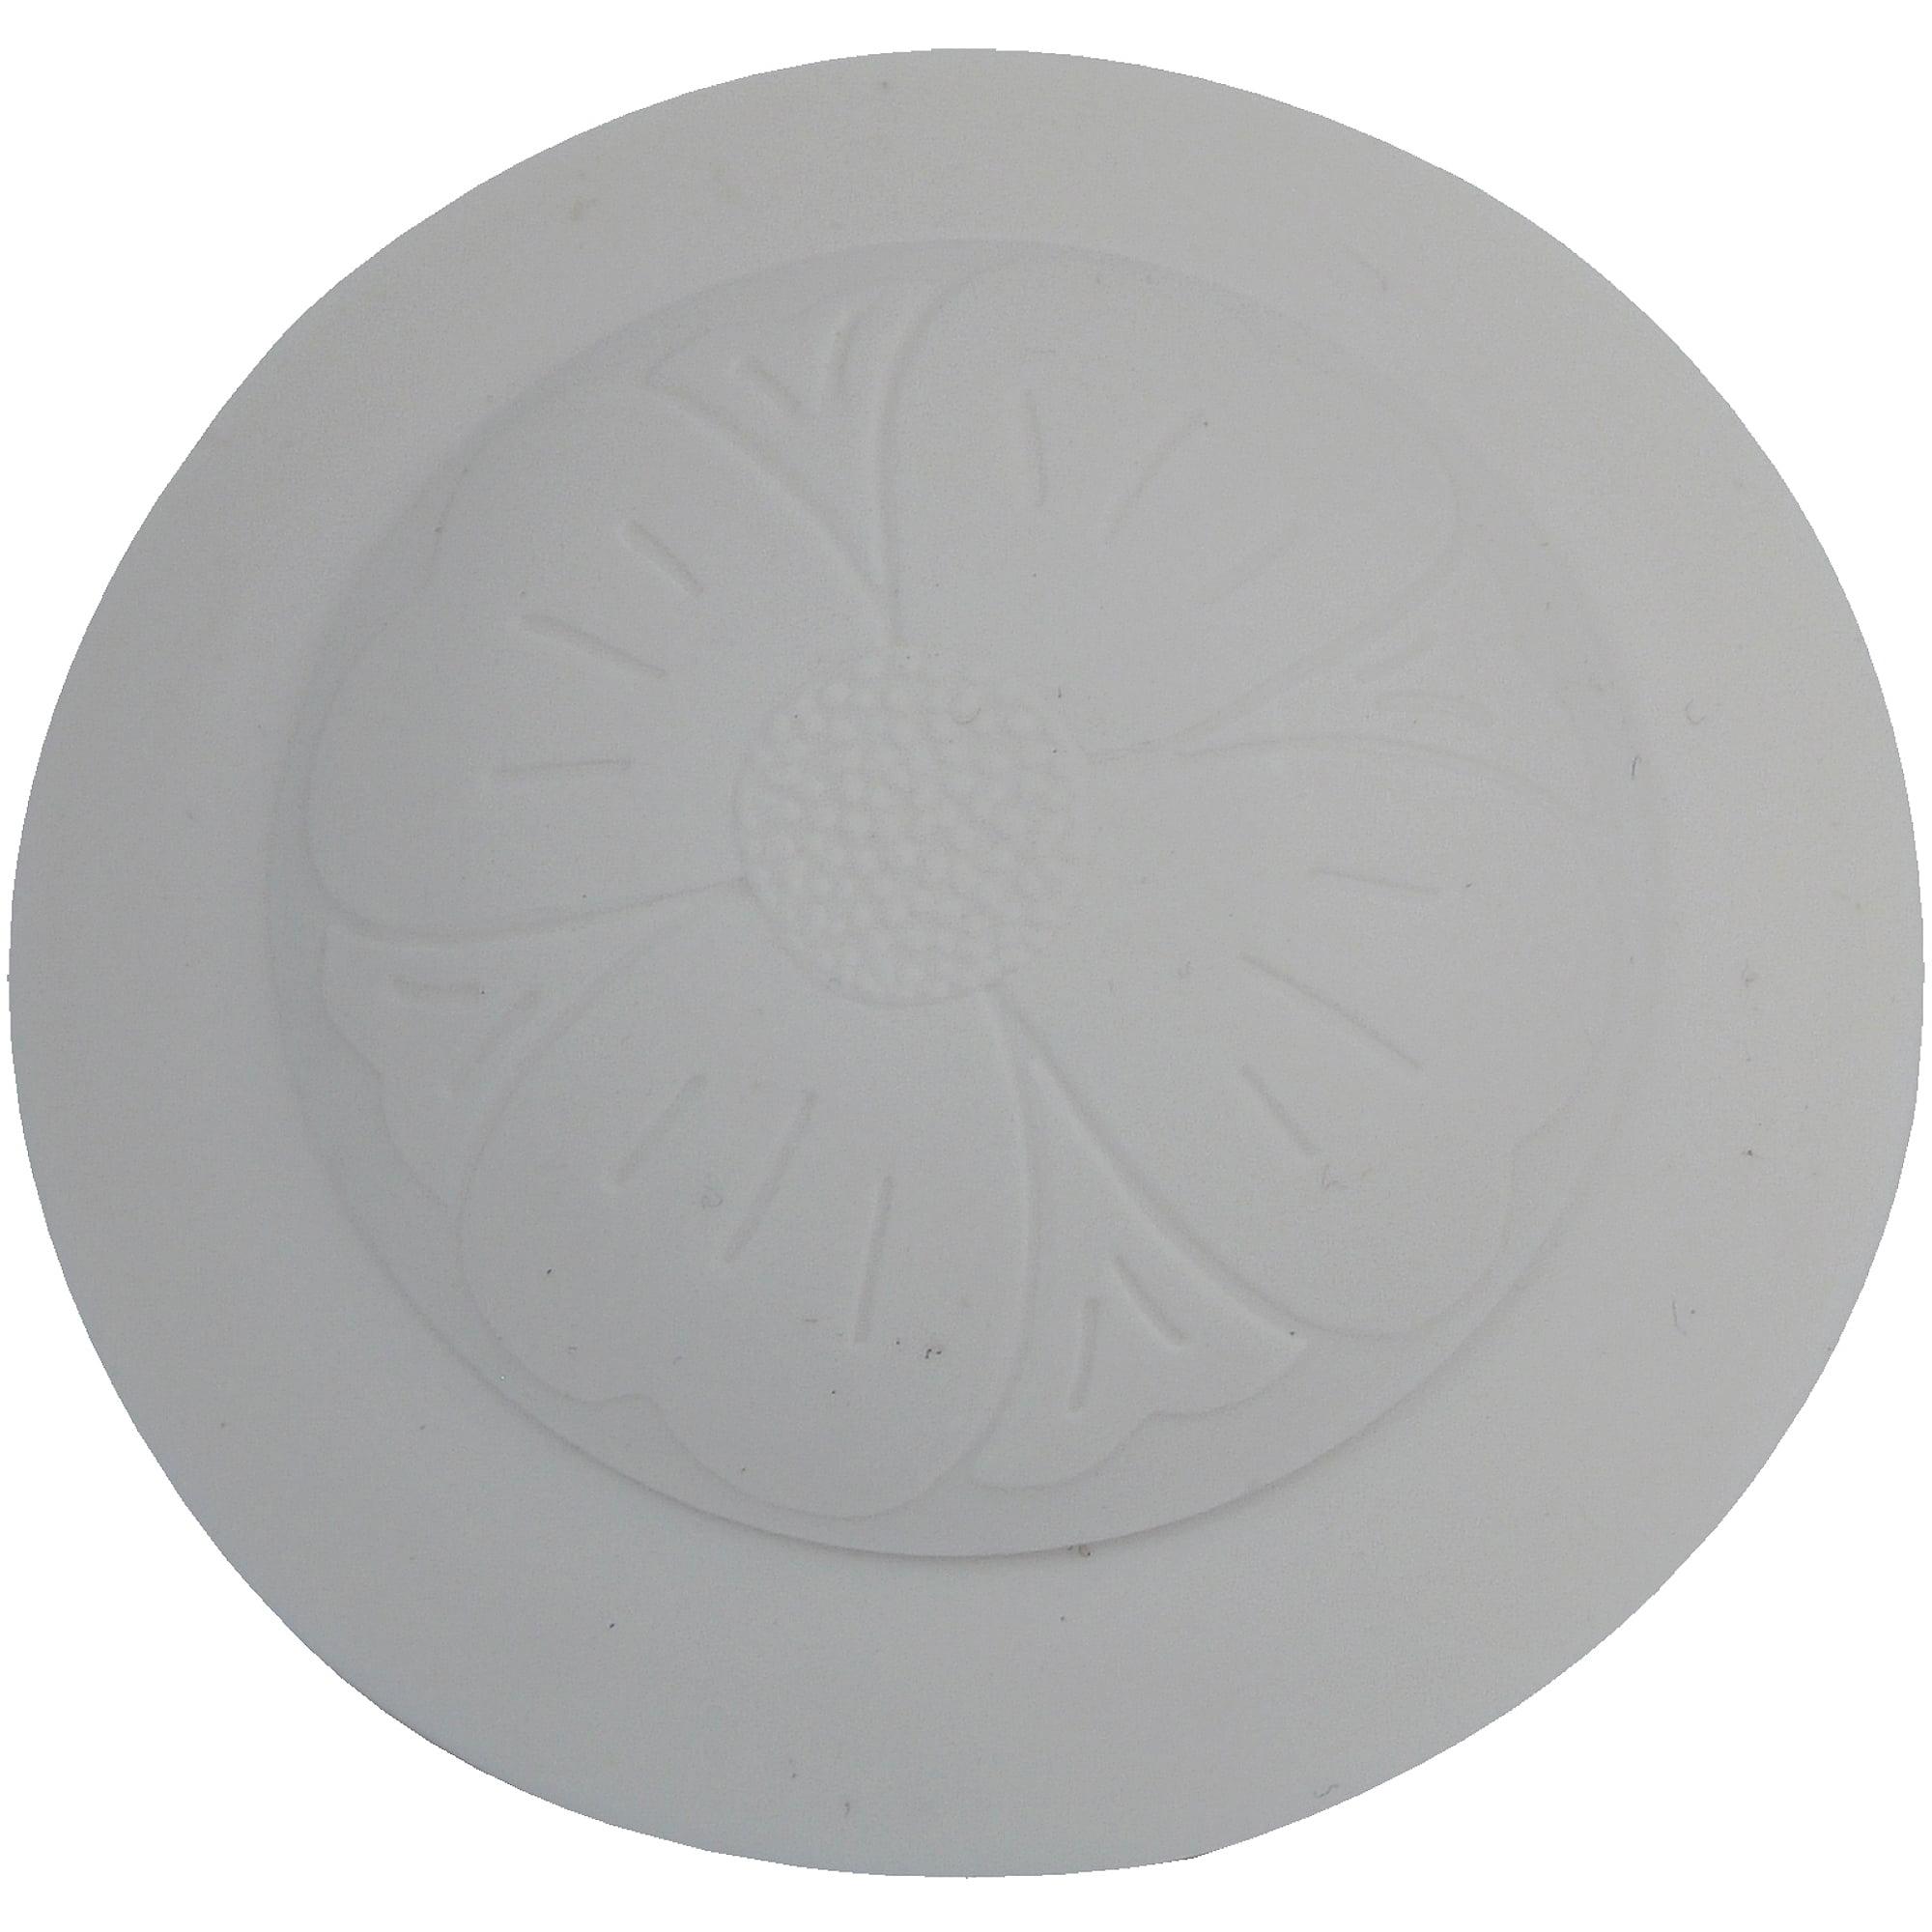 Peerless Large Pop-Up Drain Stopper, White